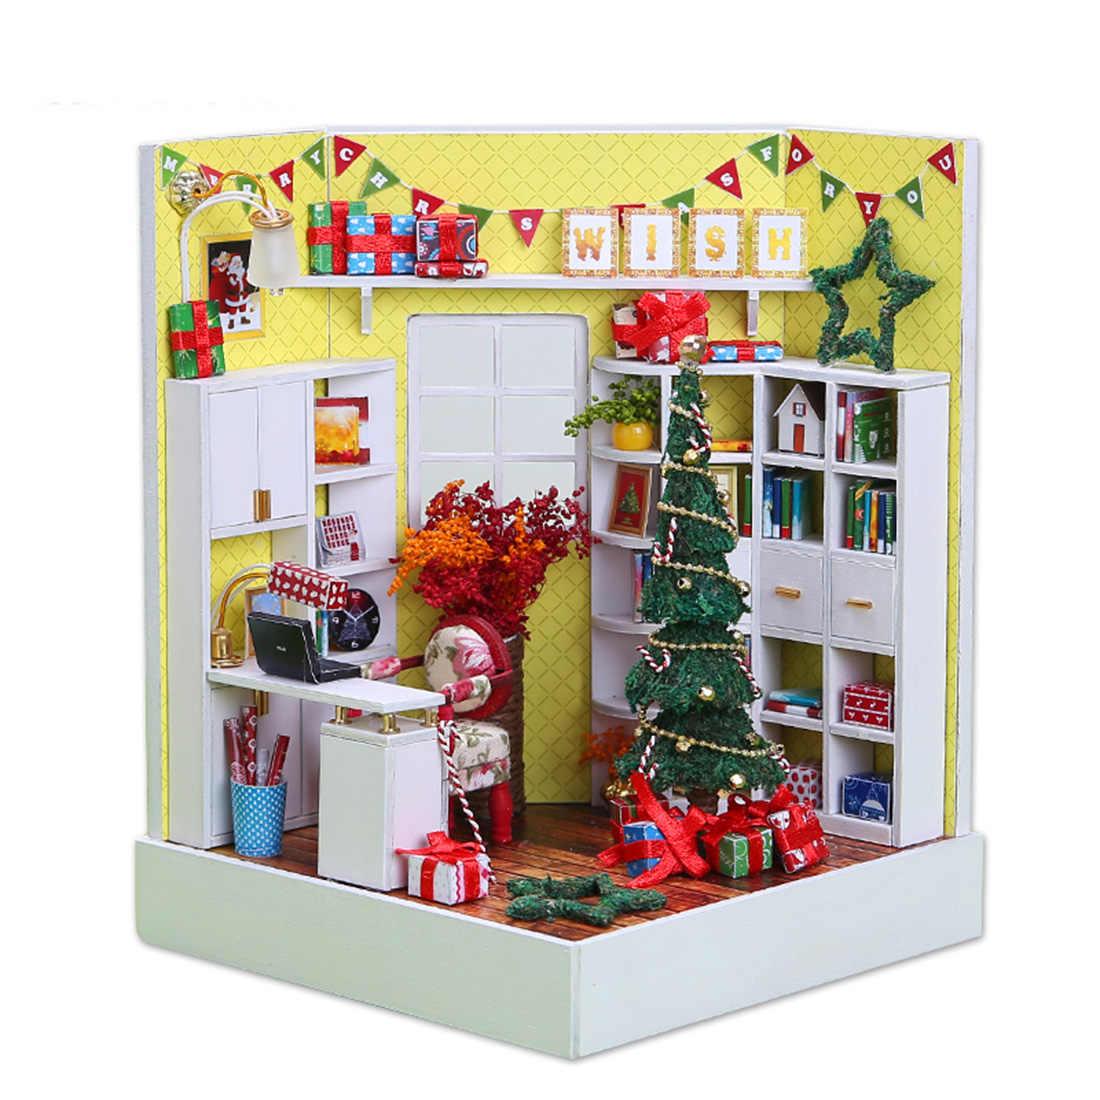 DIY Creative Handmade Theme บ้านไม้ห้องโดยสารอาคารชุดของเล่นวันเกิดคริสต์มาสของขวัญ - Merry Christmas